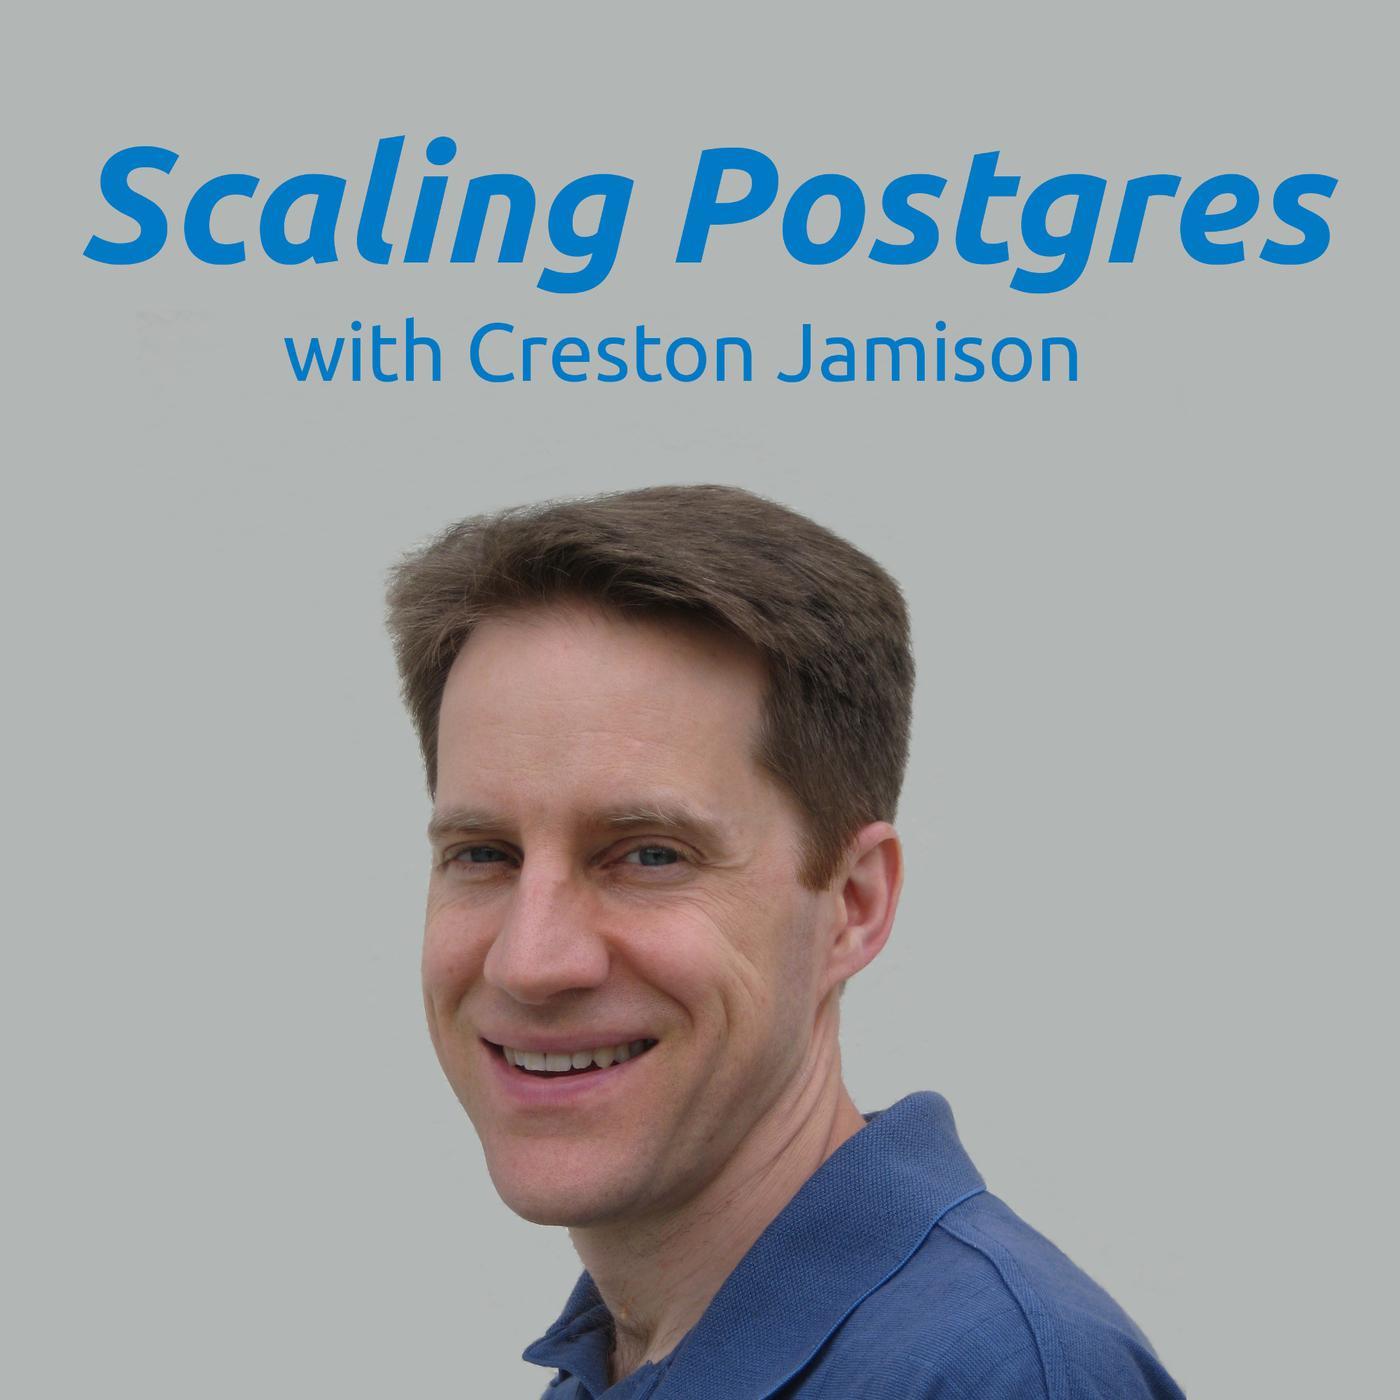 Scaling Postgres (podcast) - Creston Jamison | Listen Notes